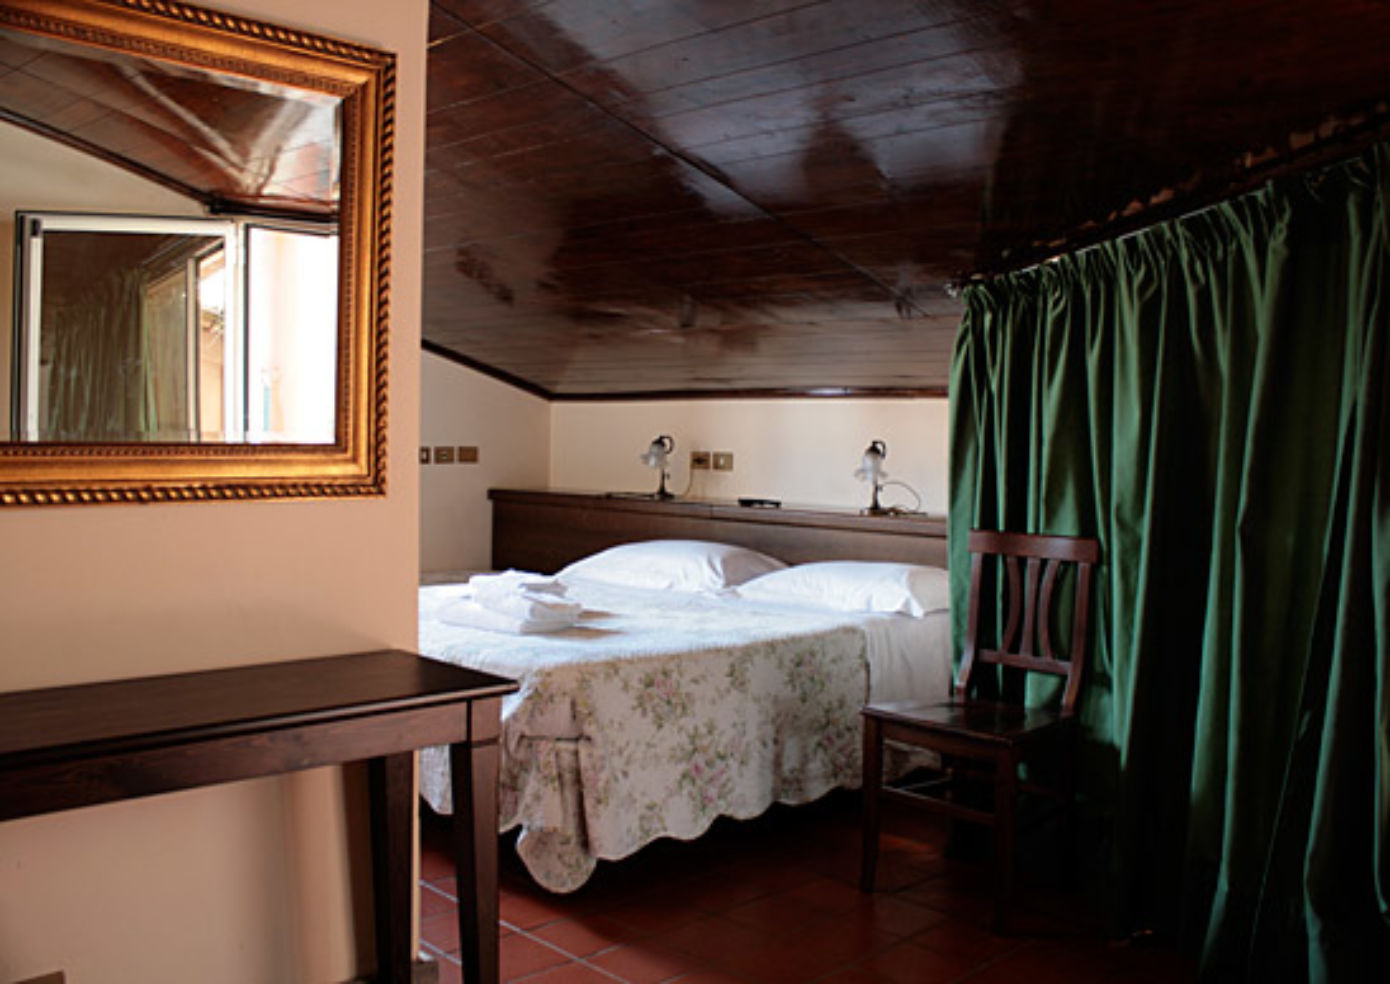 Room 62 at Okapi Rooms.